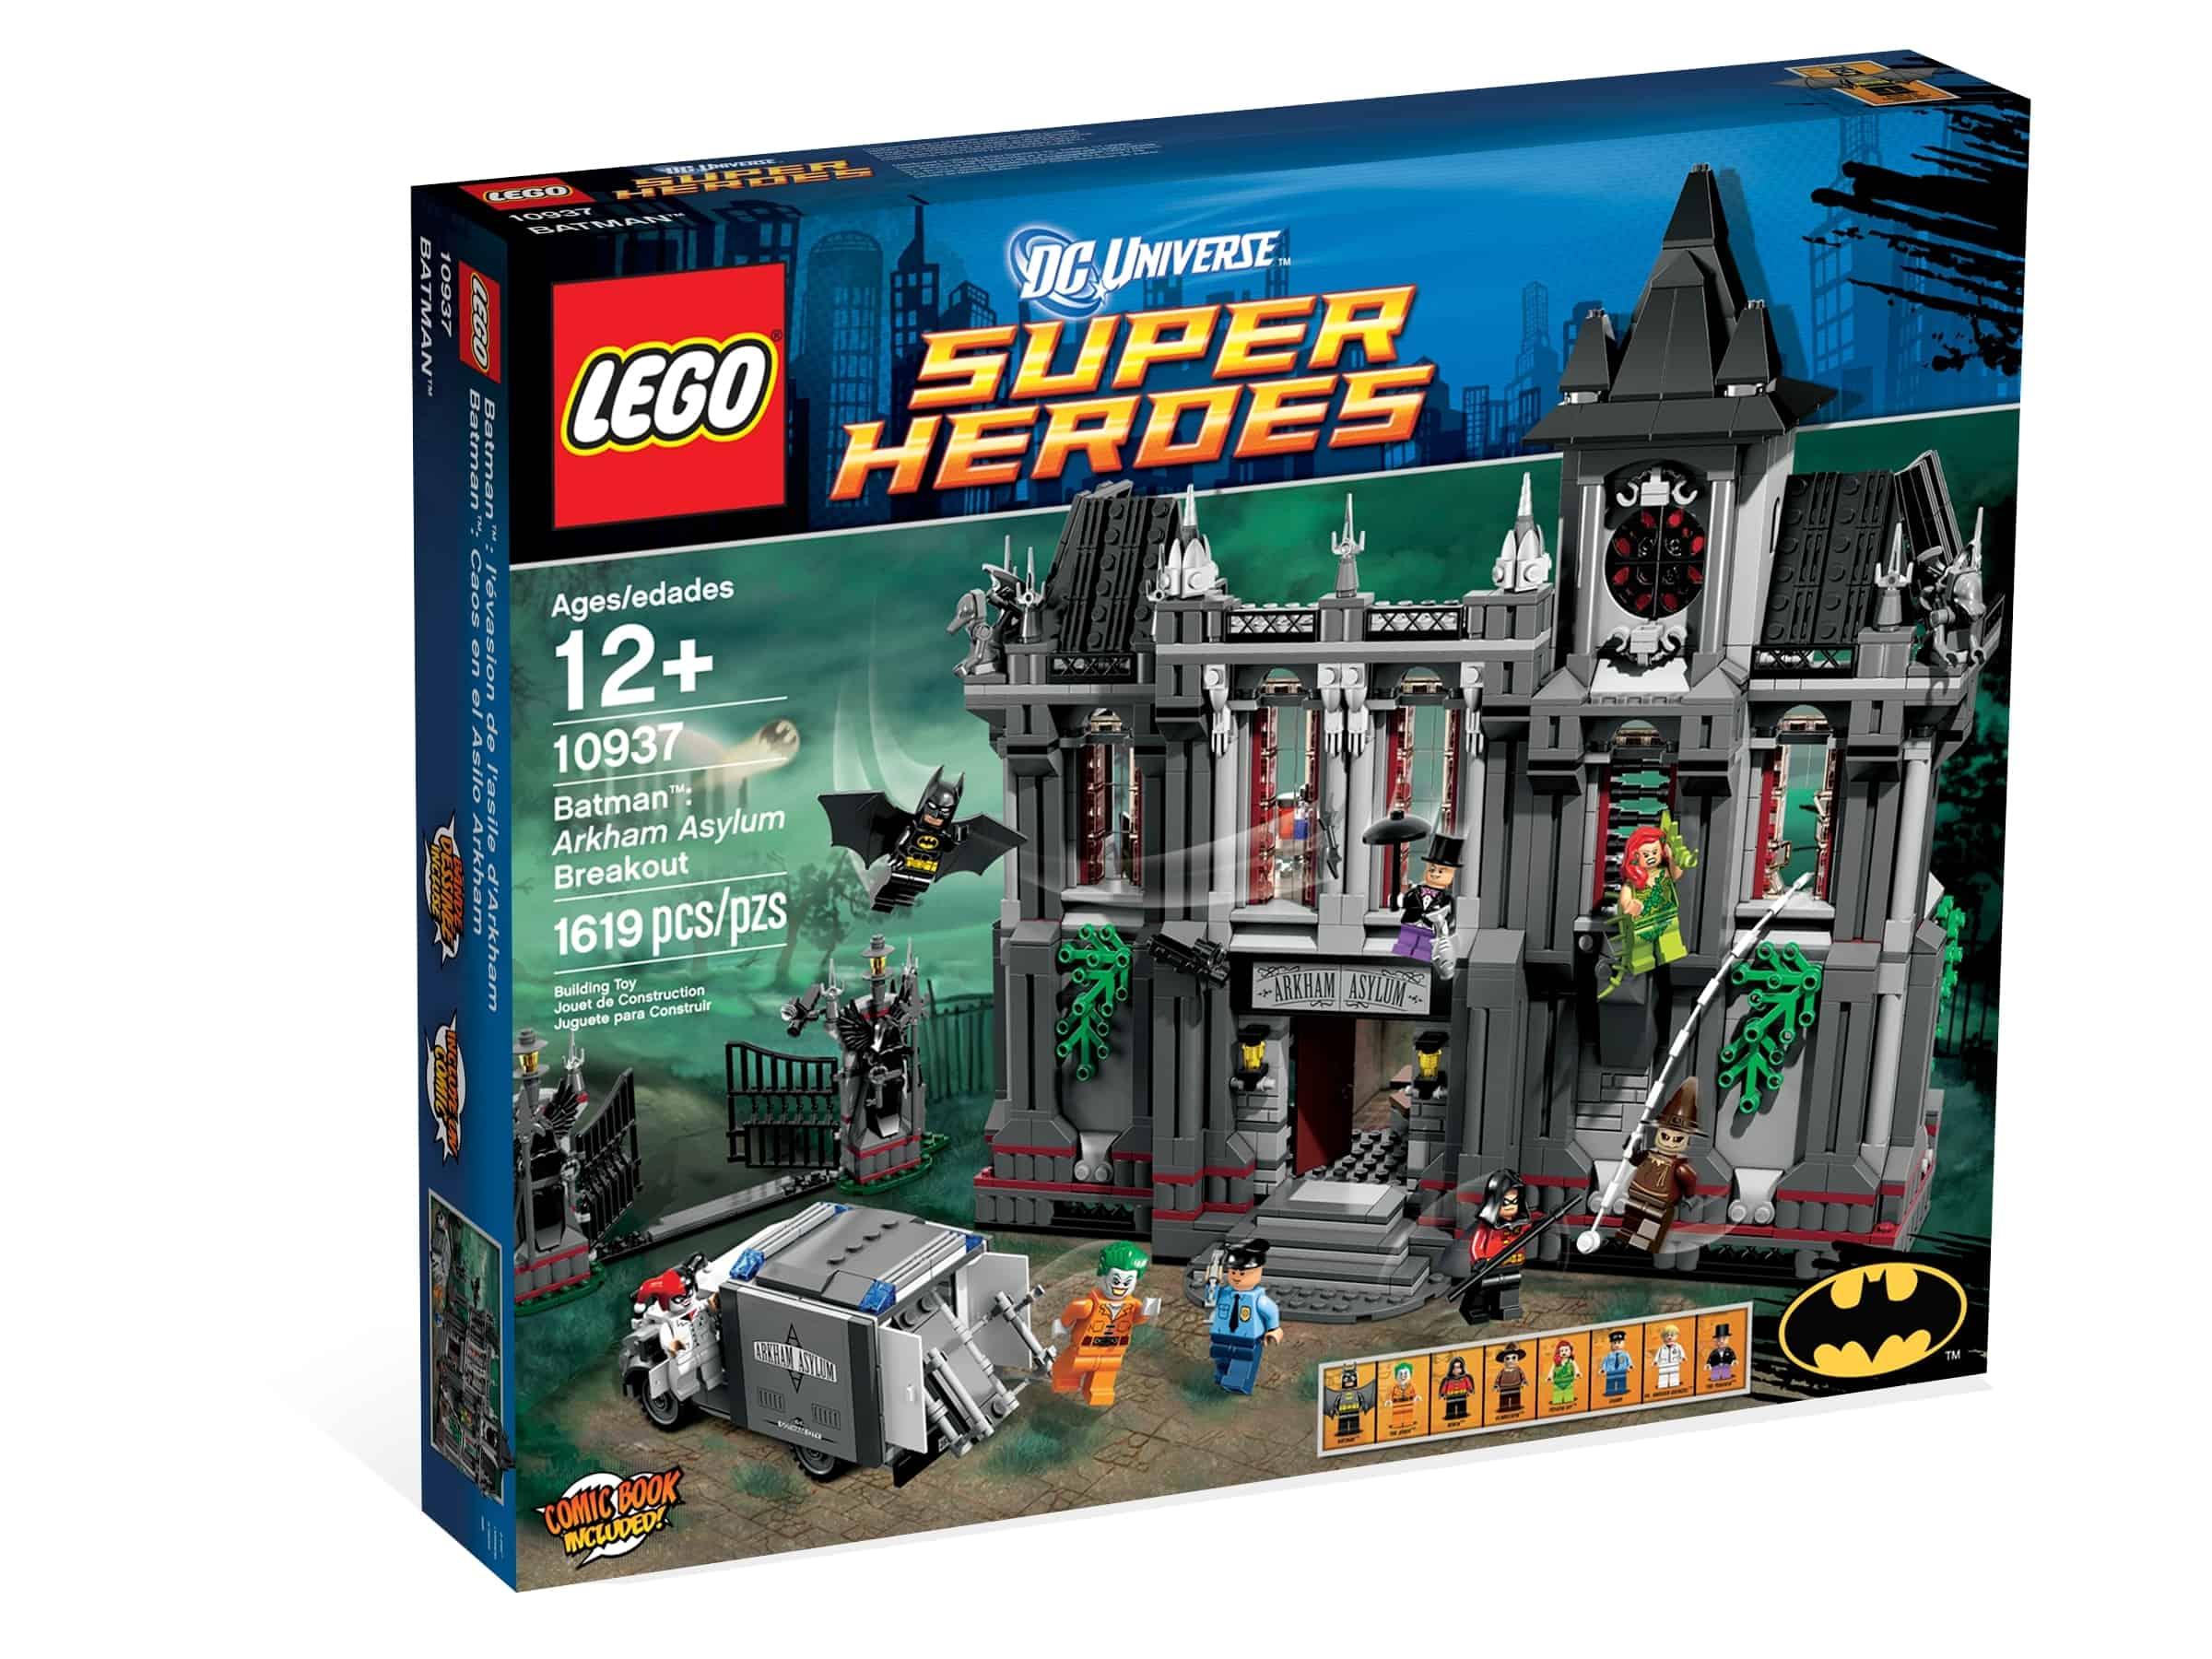 lego 10937 batman flukten fra arkham asylum